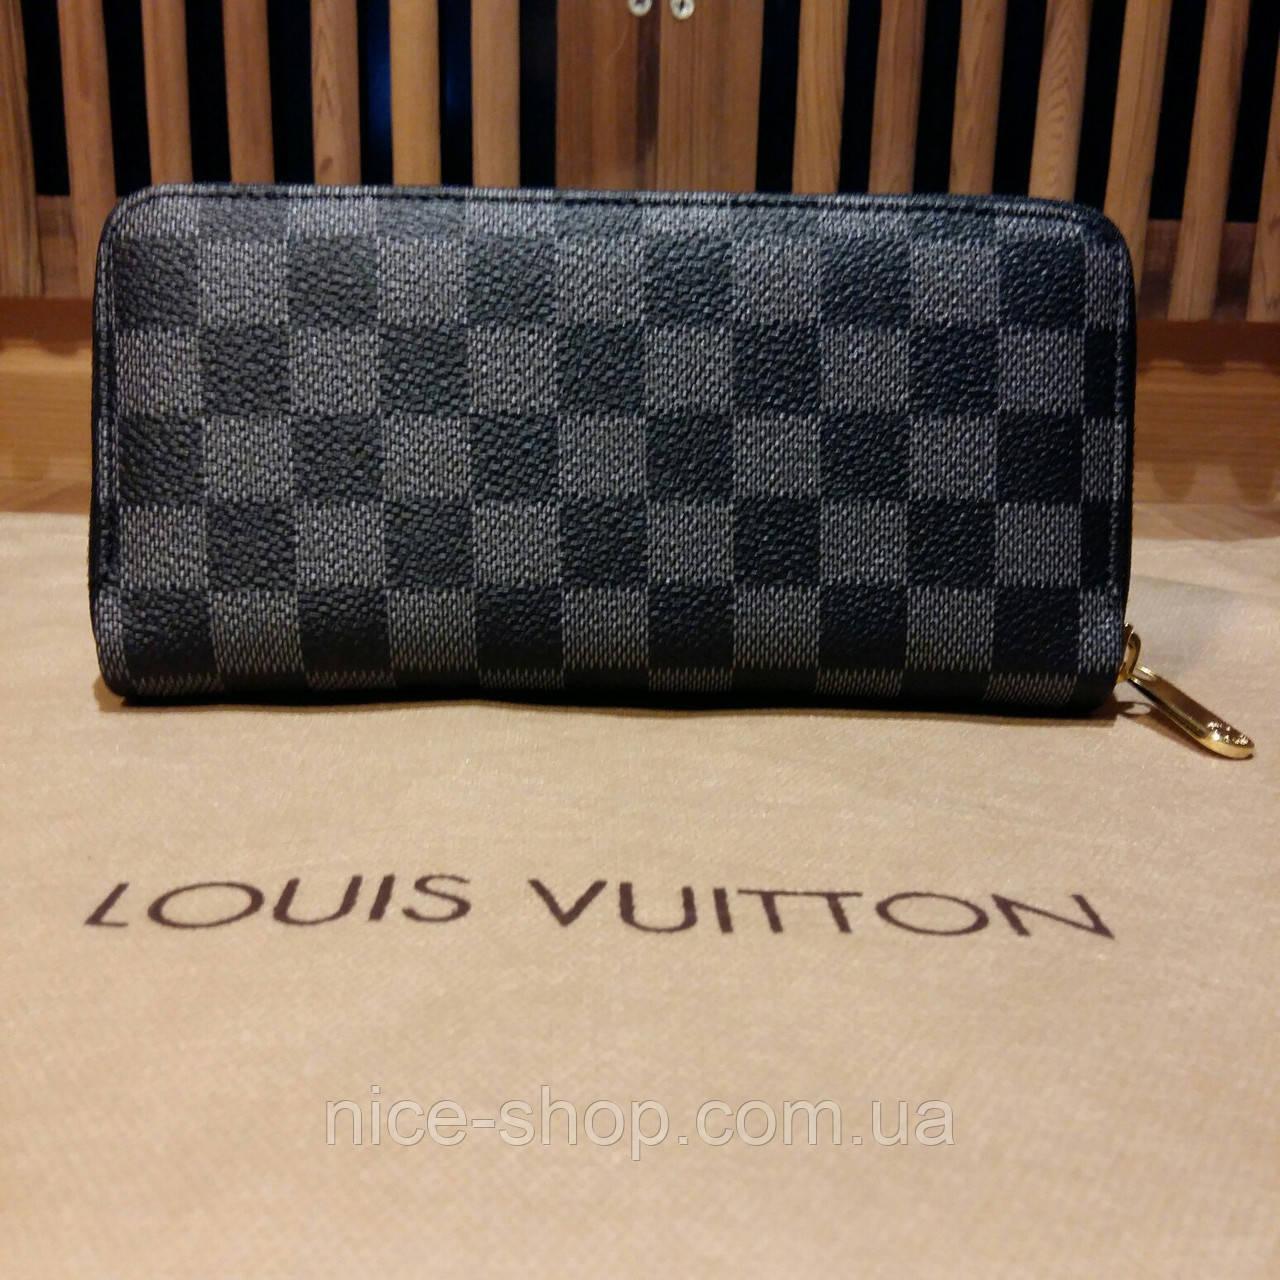 c4e1a5d0a1dd Кошелек Louis Vuitton серый в клетку на молнии: продажа, цена в ...